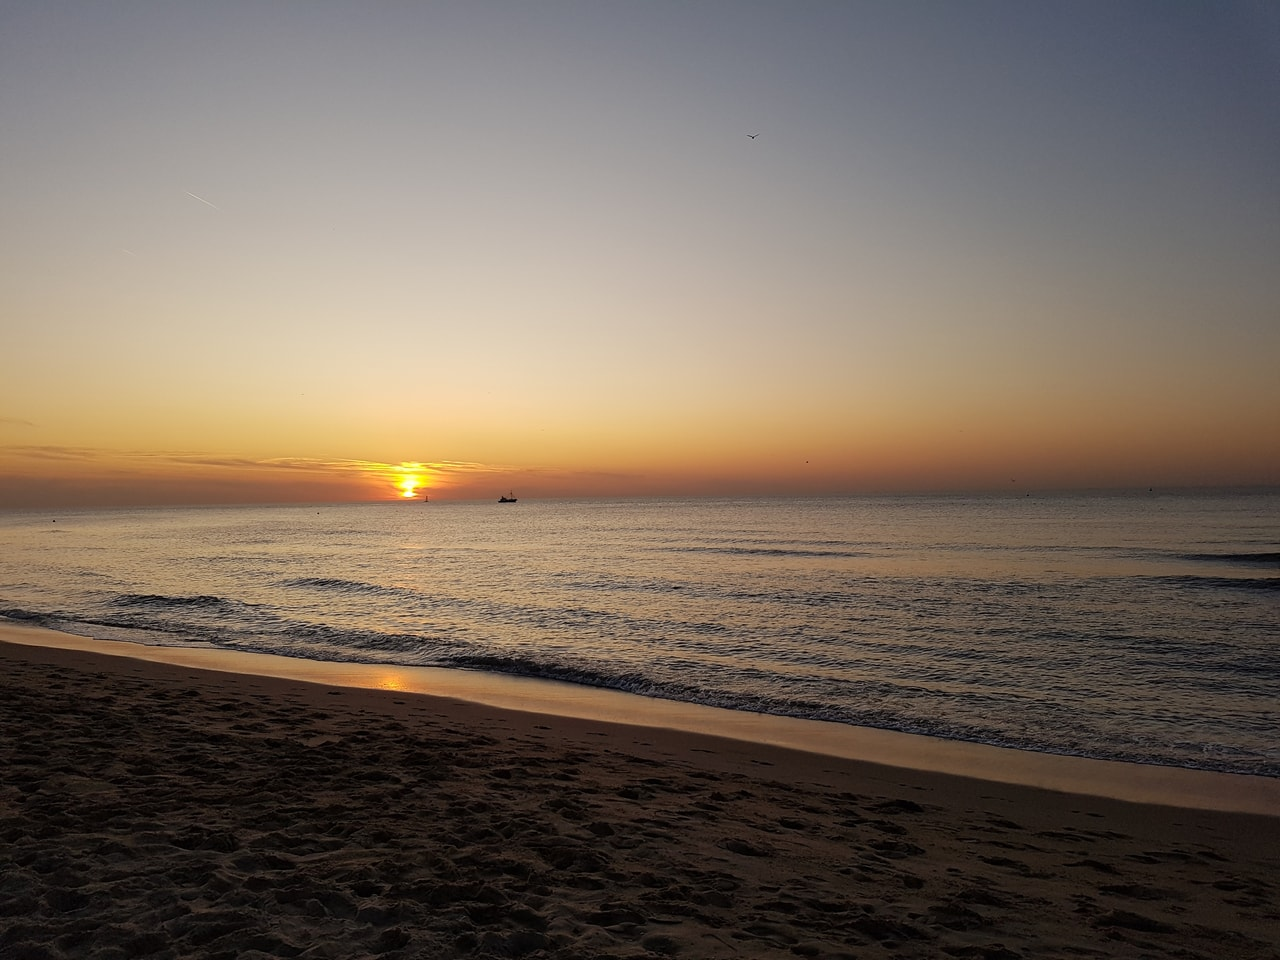 beach, romantic, and sand image